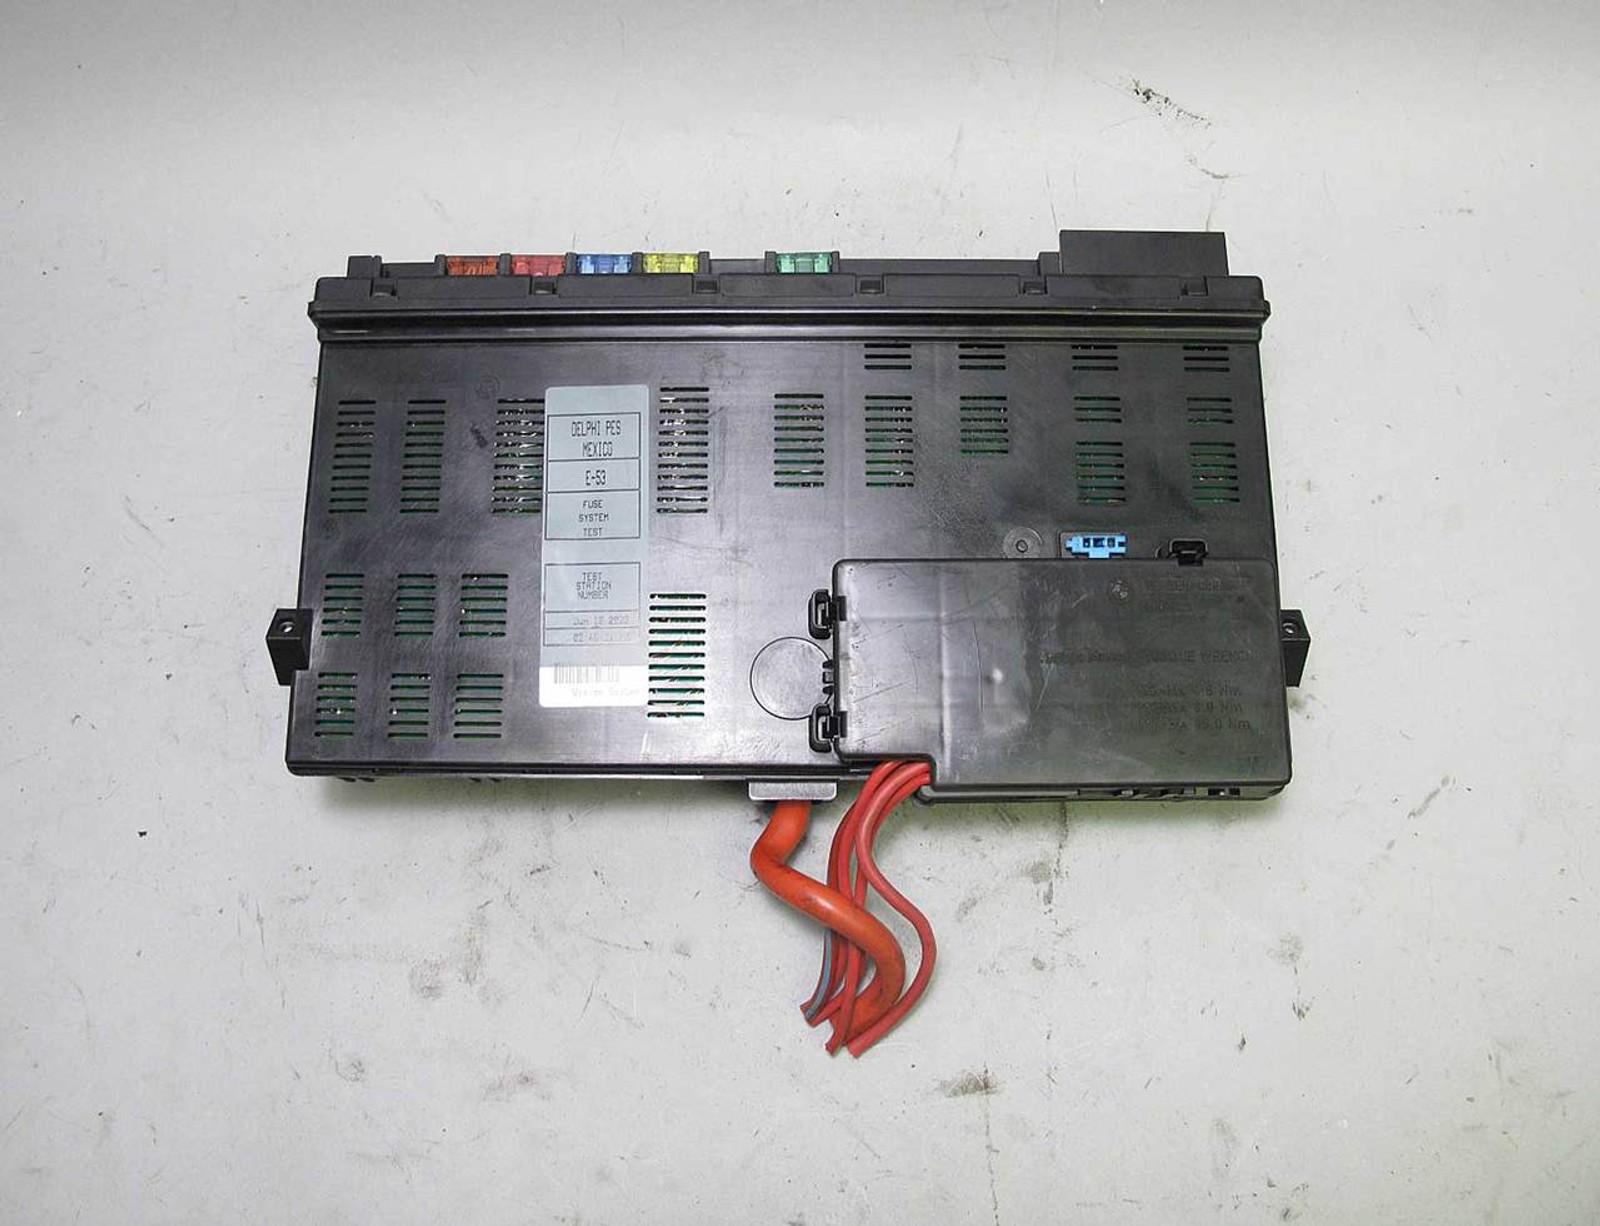 2003 Bmw E53 X5 Sav Interior Under Dash Glove Box Fuse